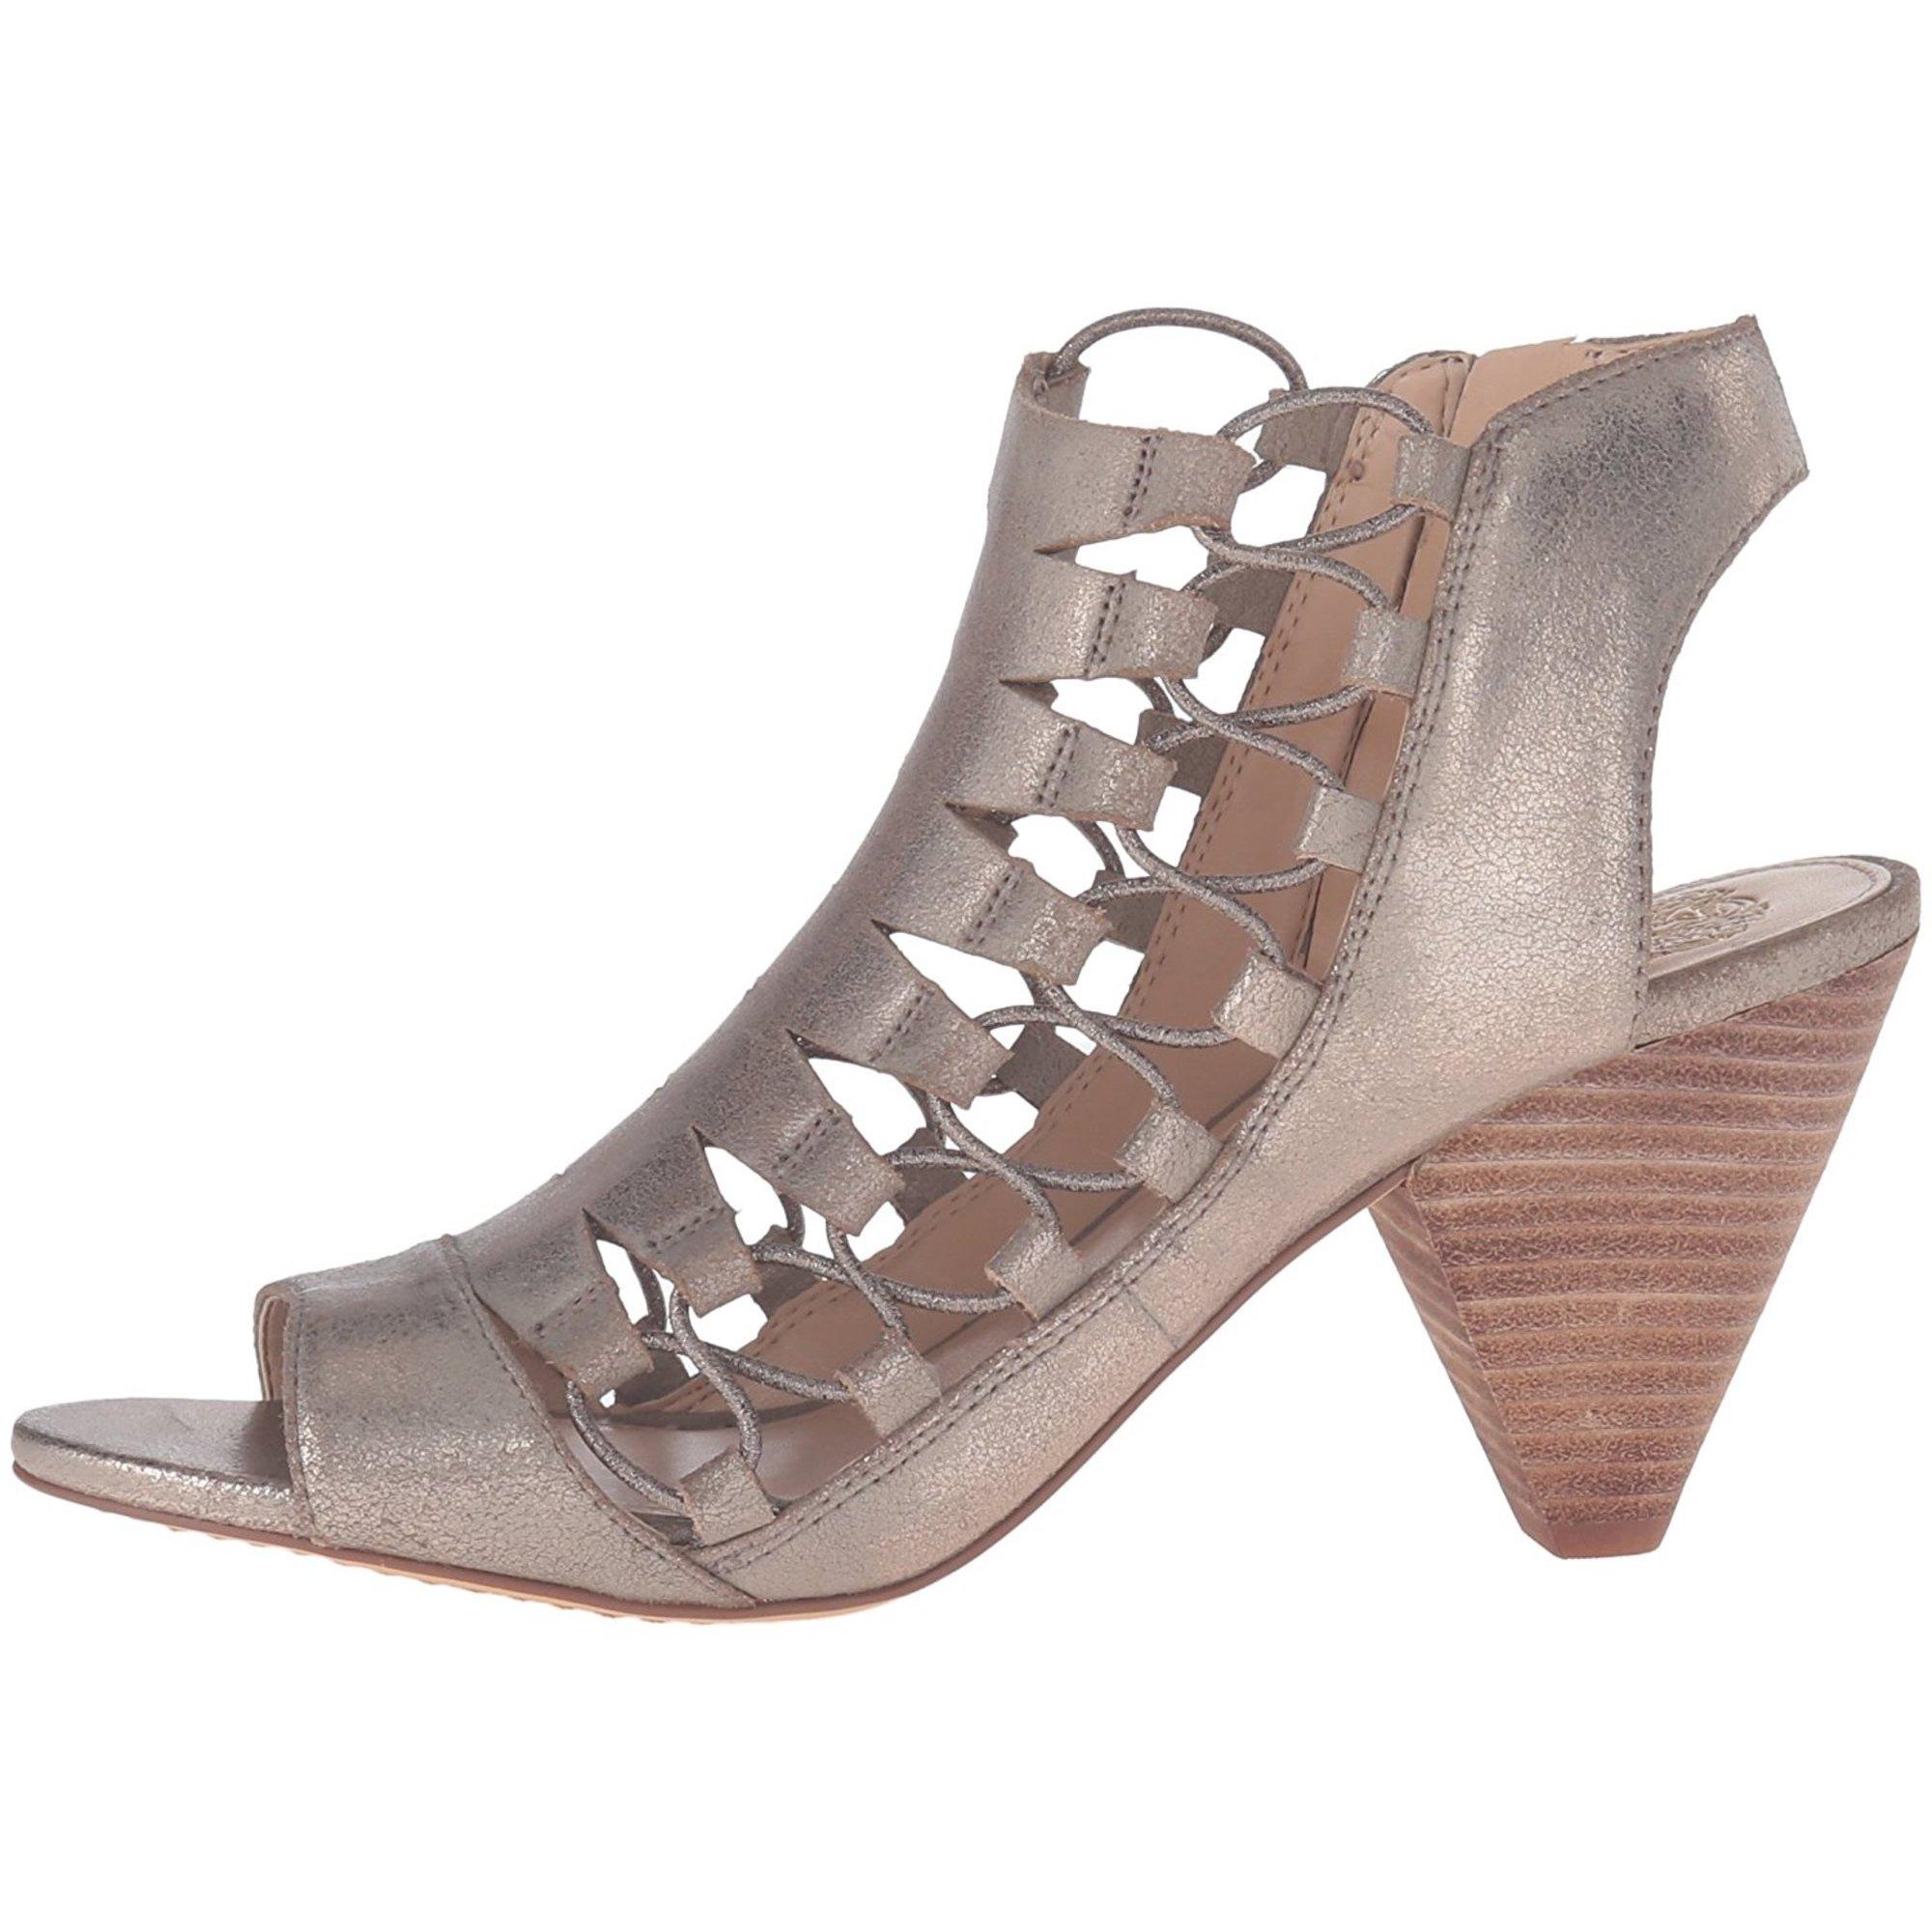 70fb583dd7b Vince Camuto Womens Eliaz Leather Peep Toe Casual Strappy